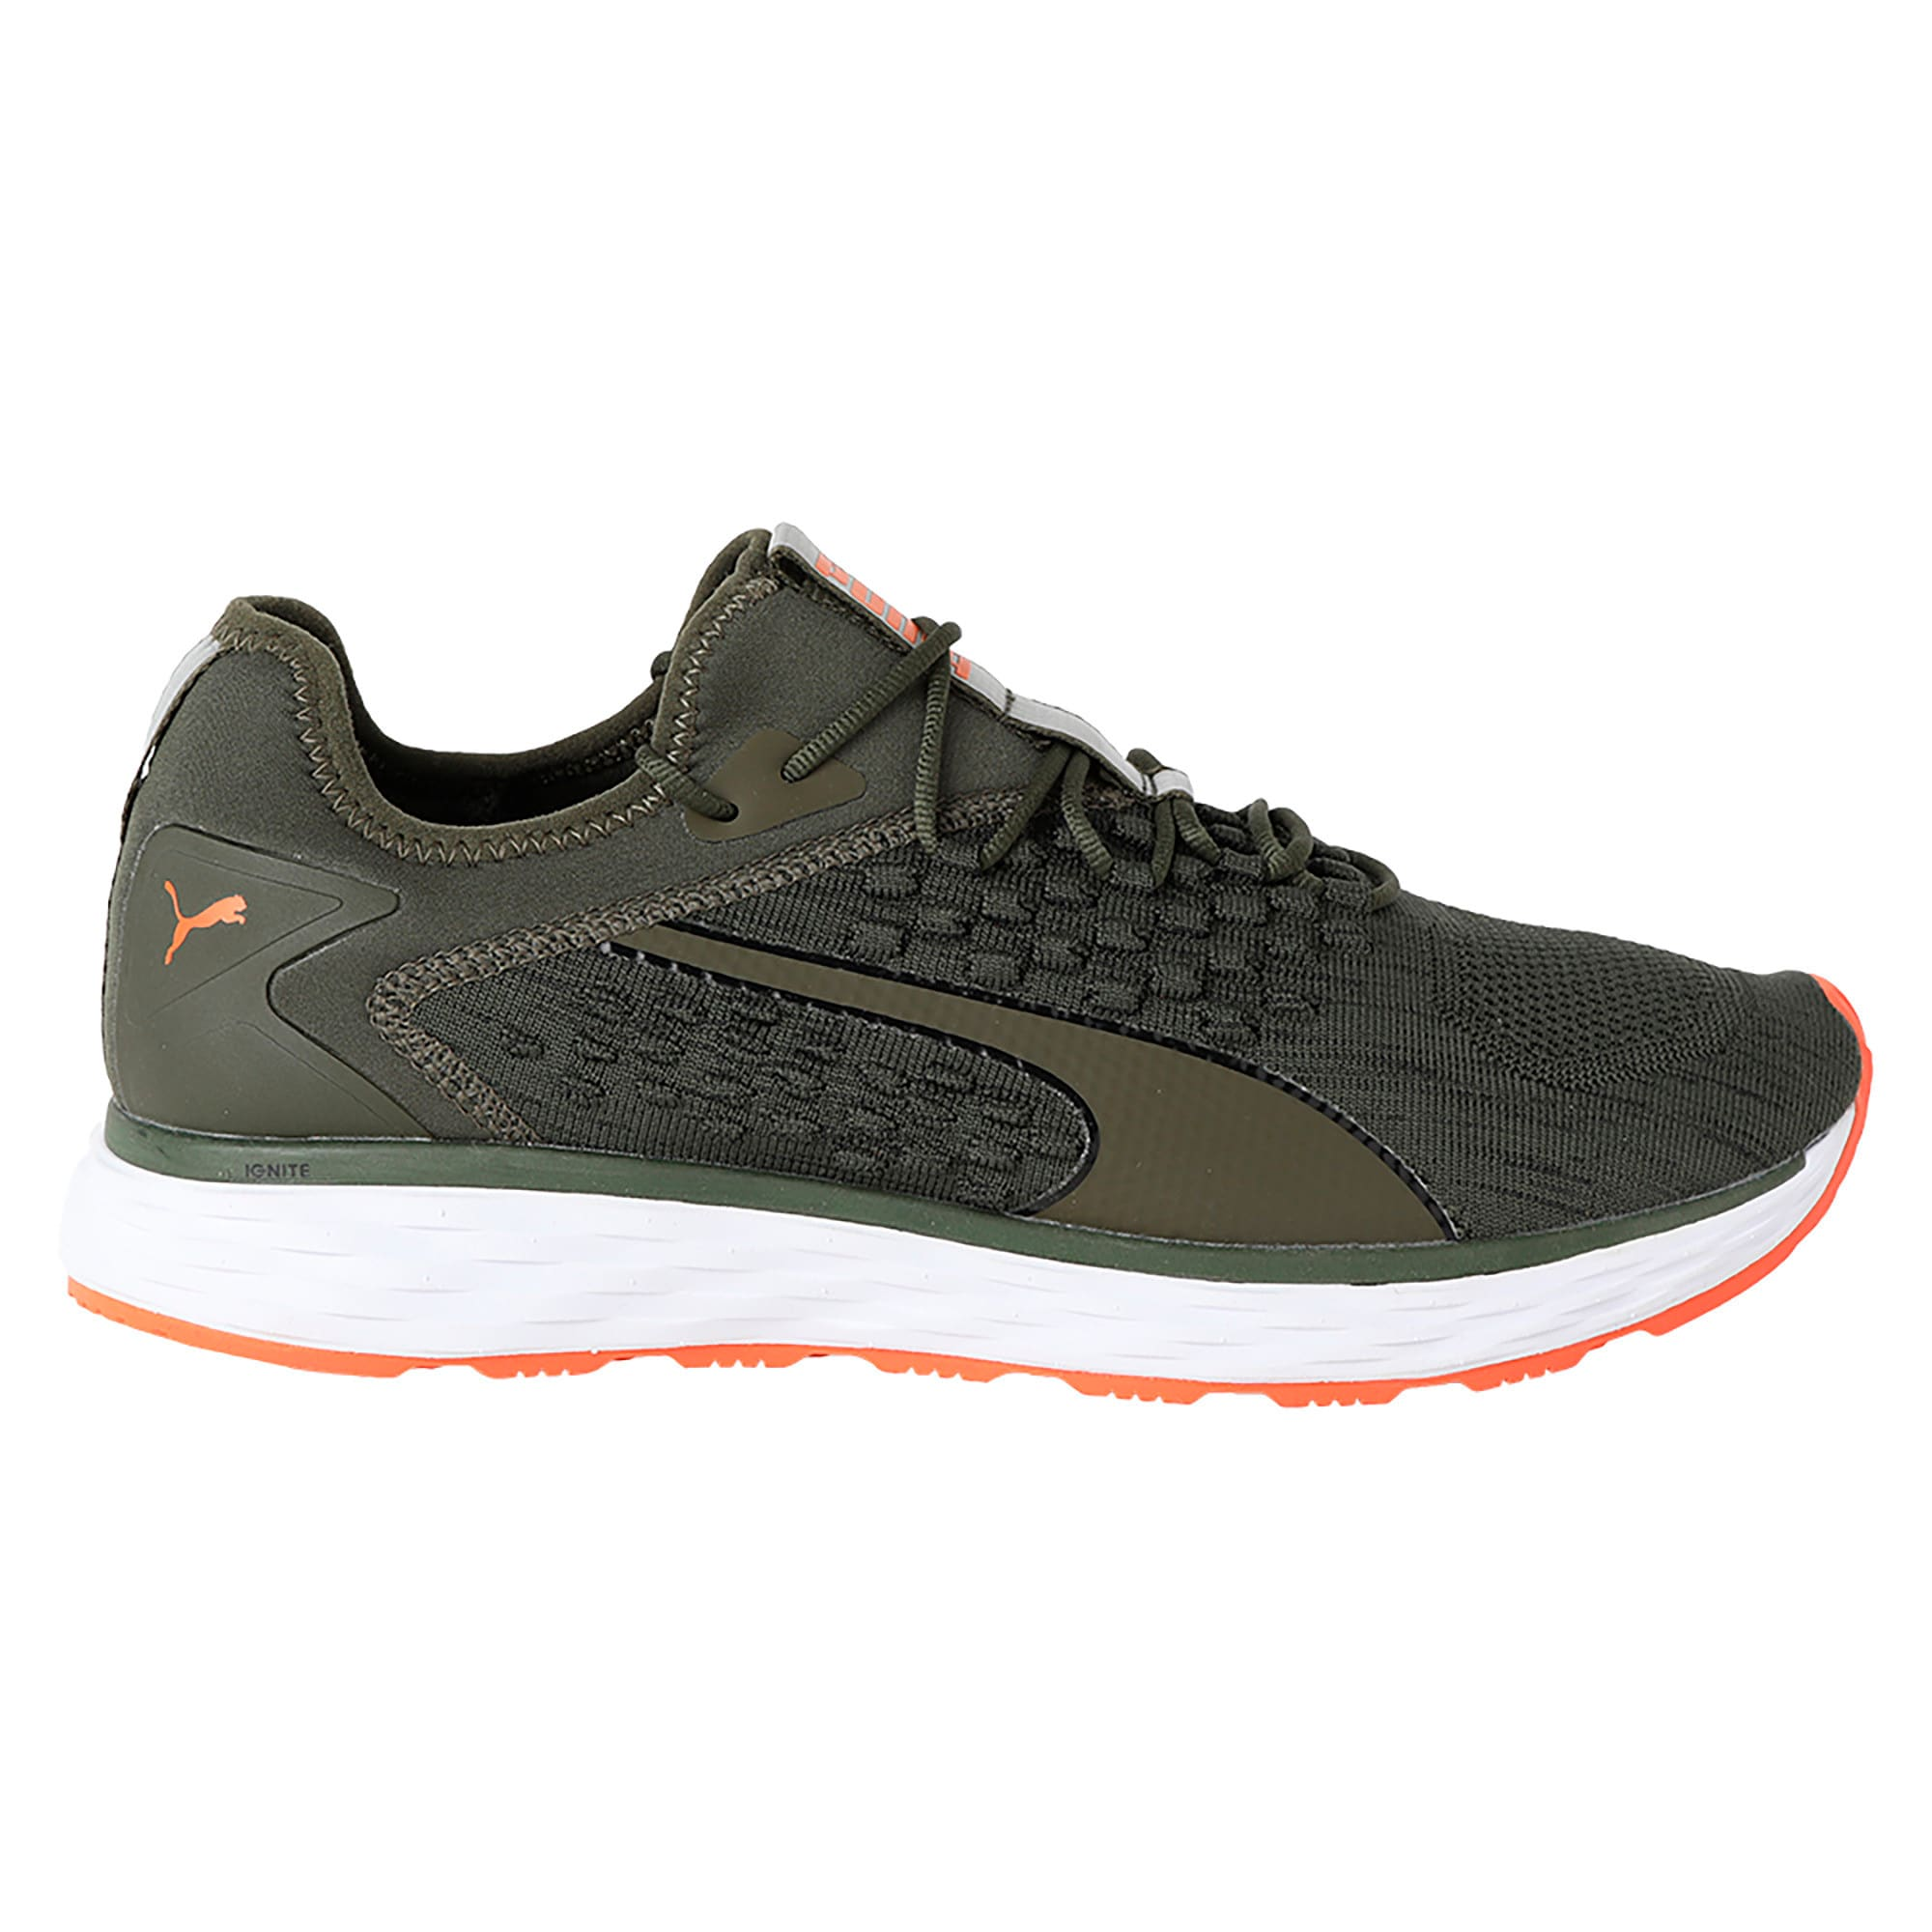 Thumbnail 6 of SPEED FUSEFIT Men's Running Shoes, Forest Night-Firecracker, medium-IND